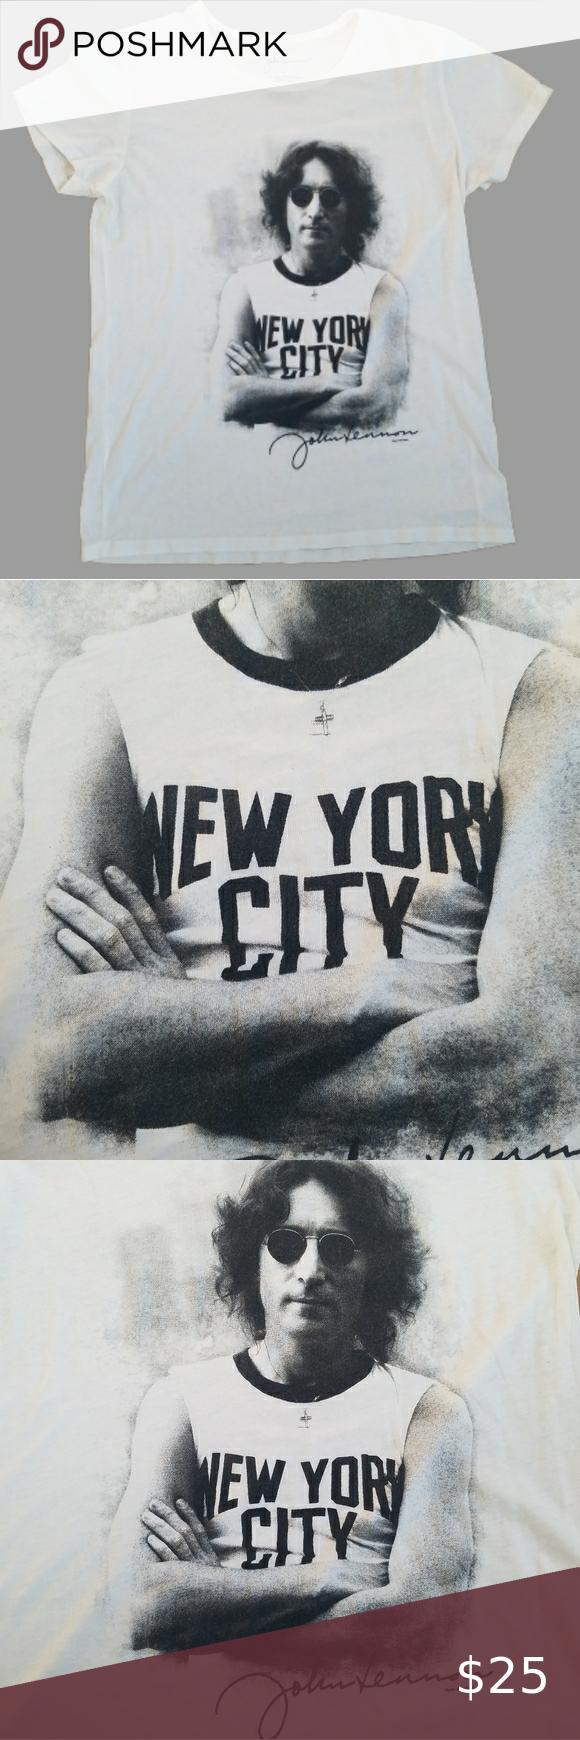 John Lennon Signature Tee Shirt In 2020 Tee Shirts Shirts John Lennon